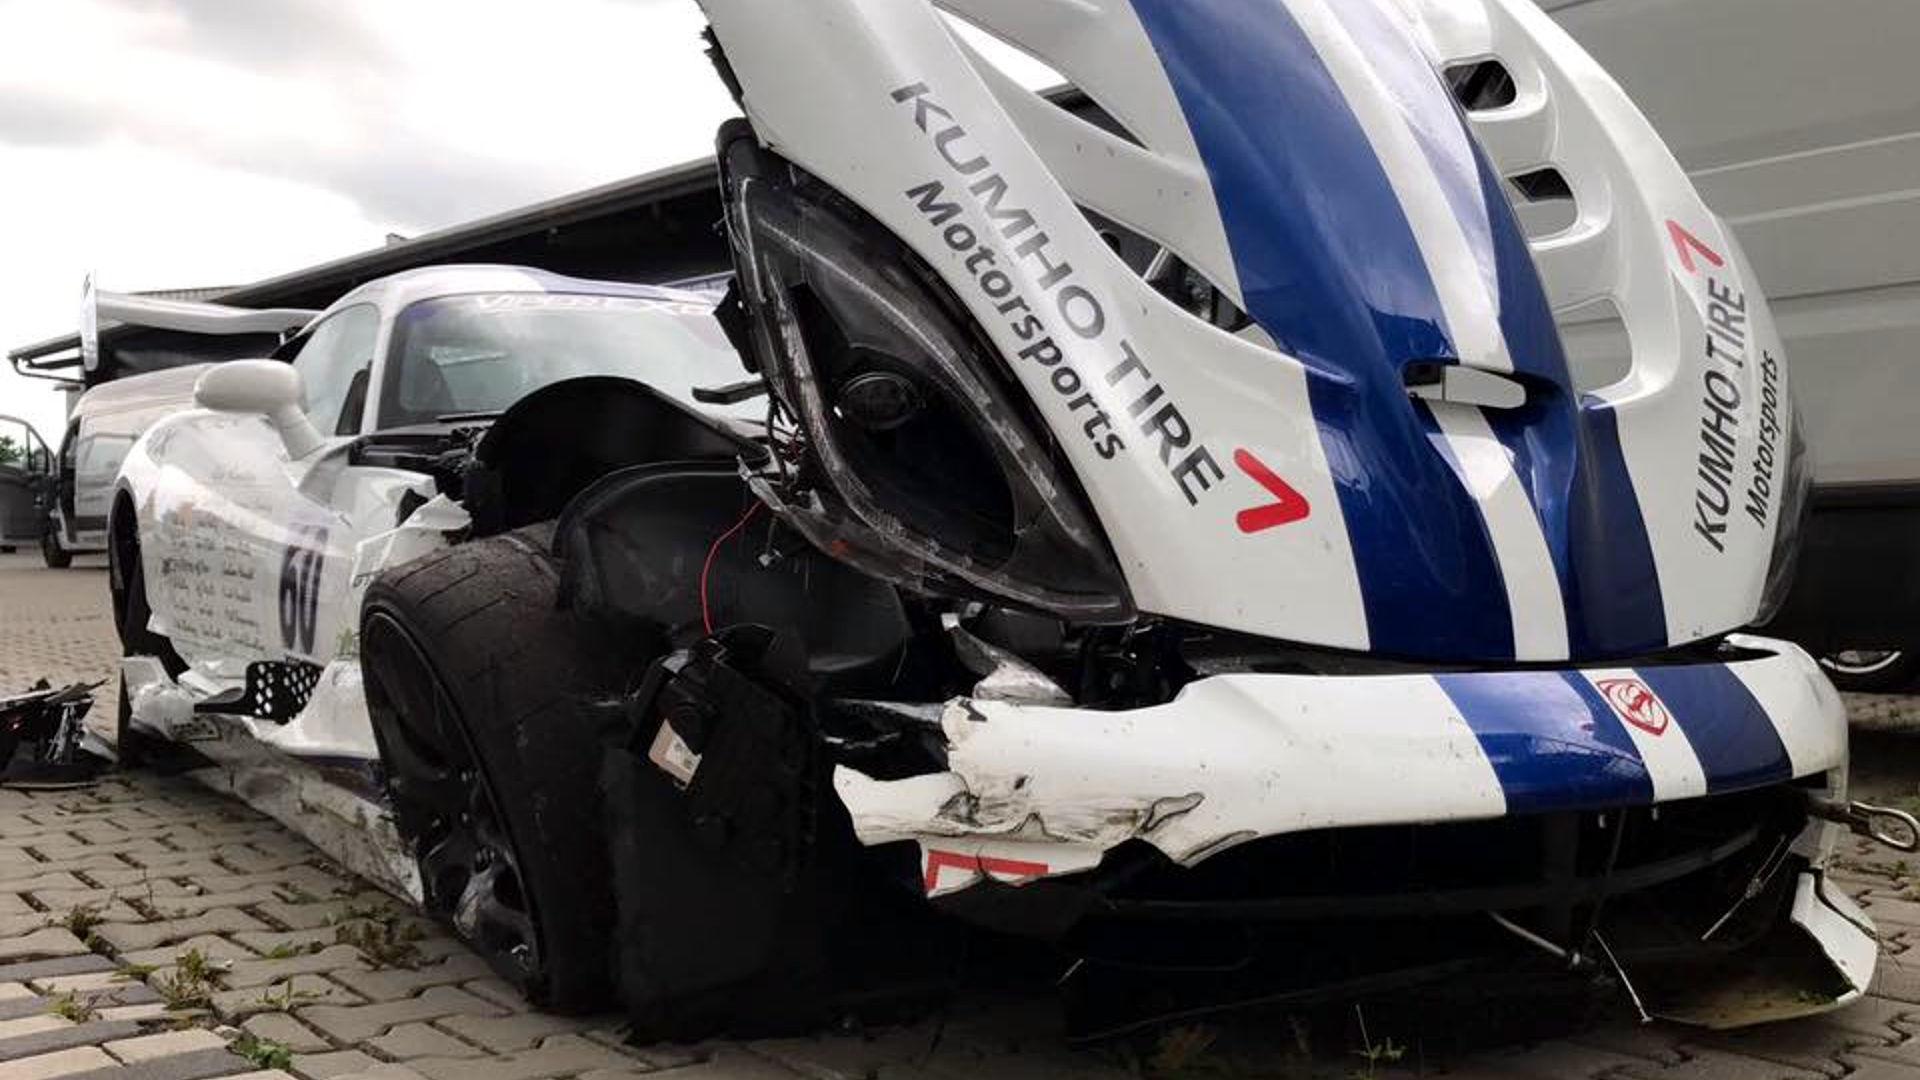 Viper ACR Nurburgring crash acidente batida